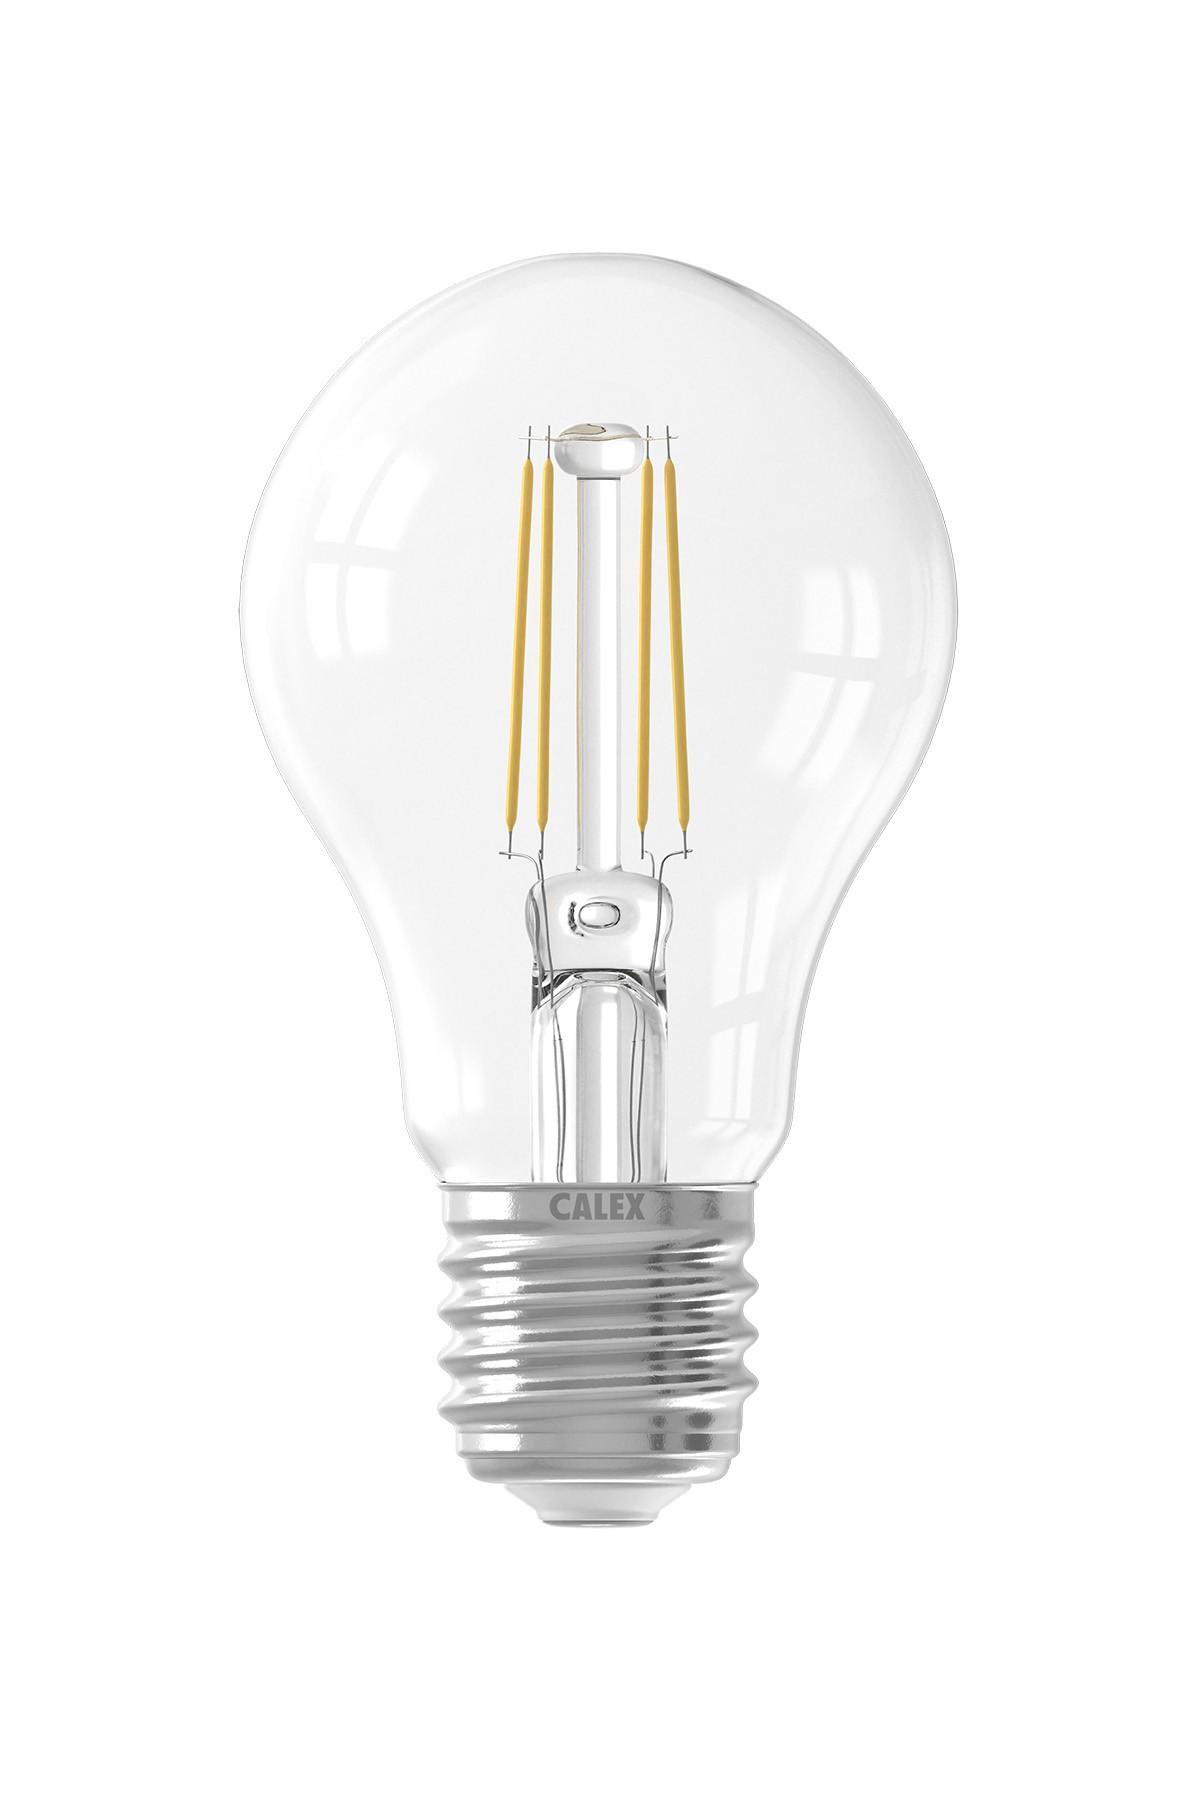 Calex LED volglas Filament Standaardlamp 240V 4W 400lm E27 A60, Helder 2700K met sensor